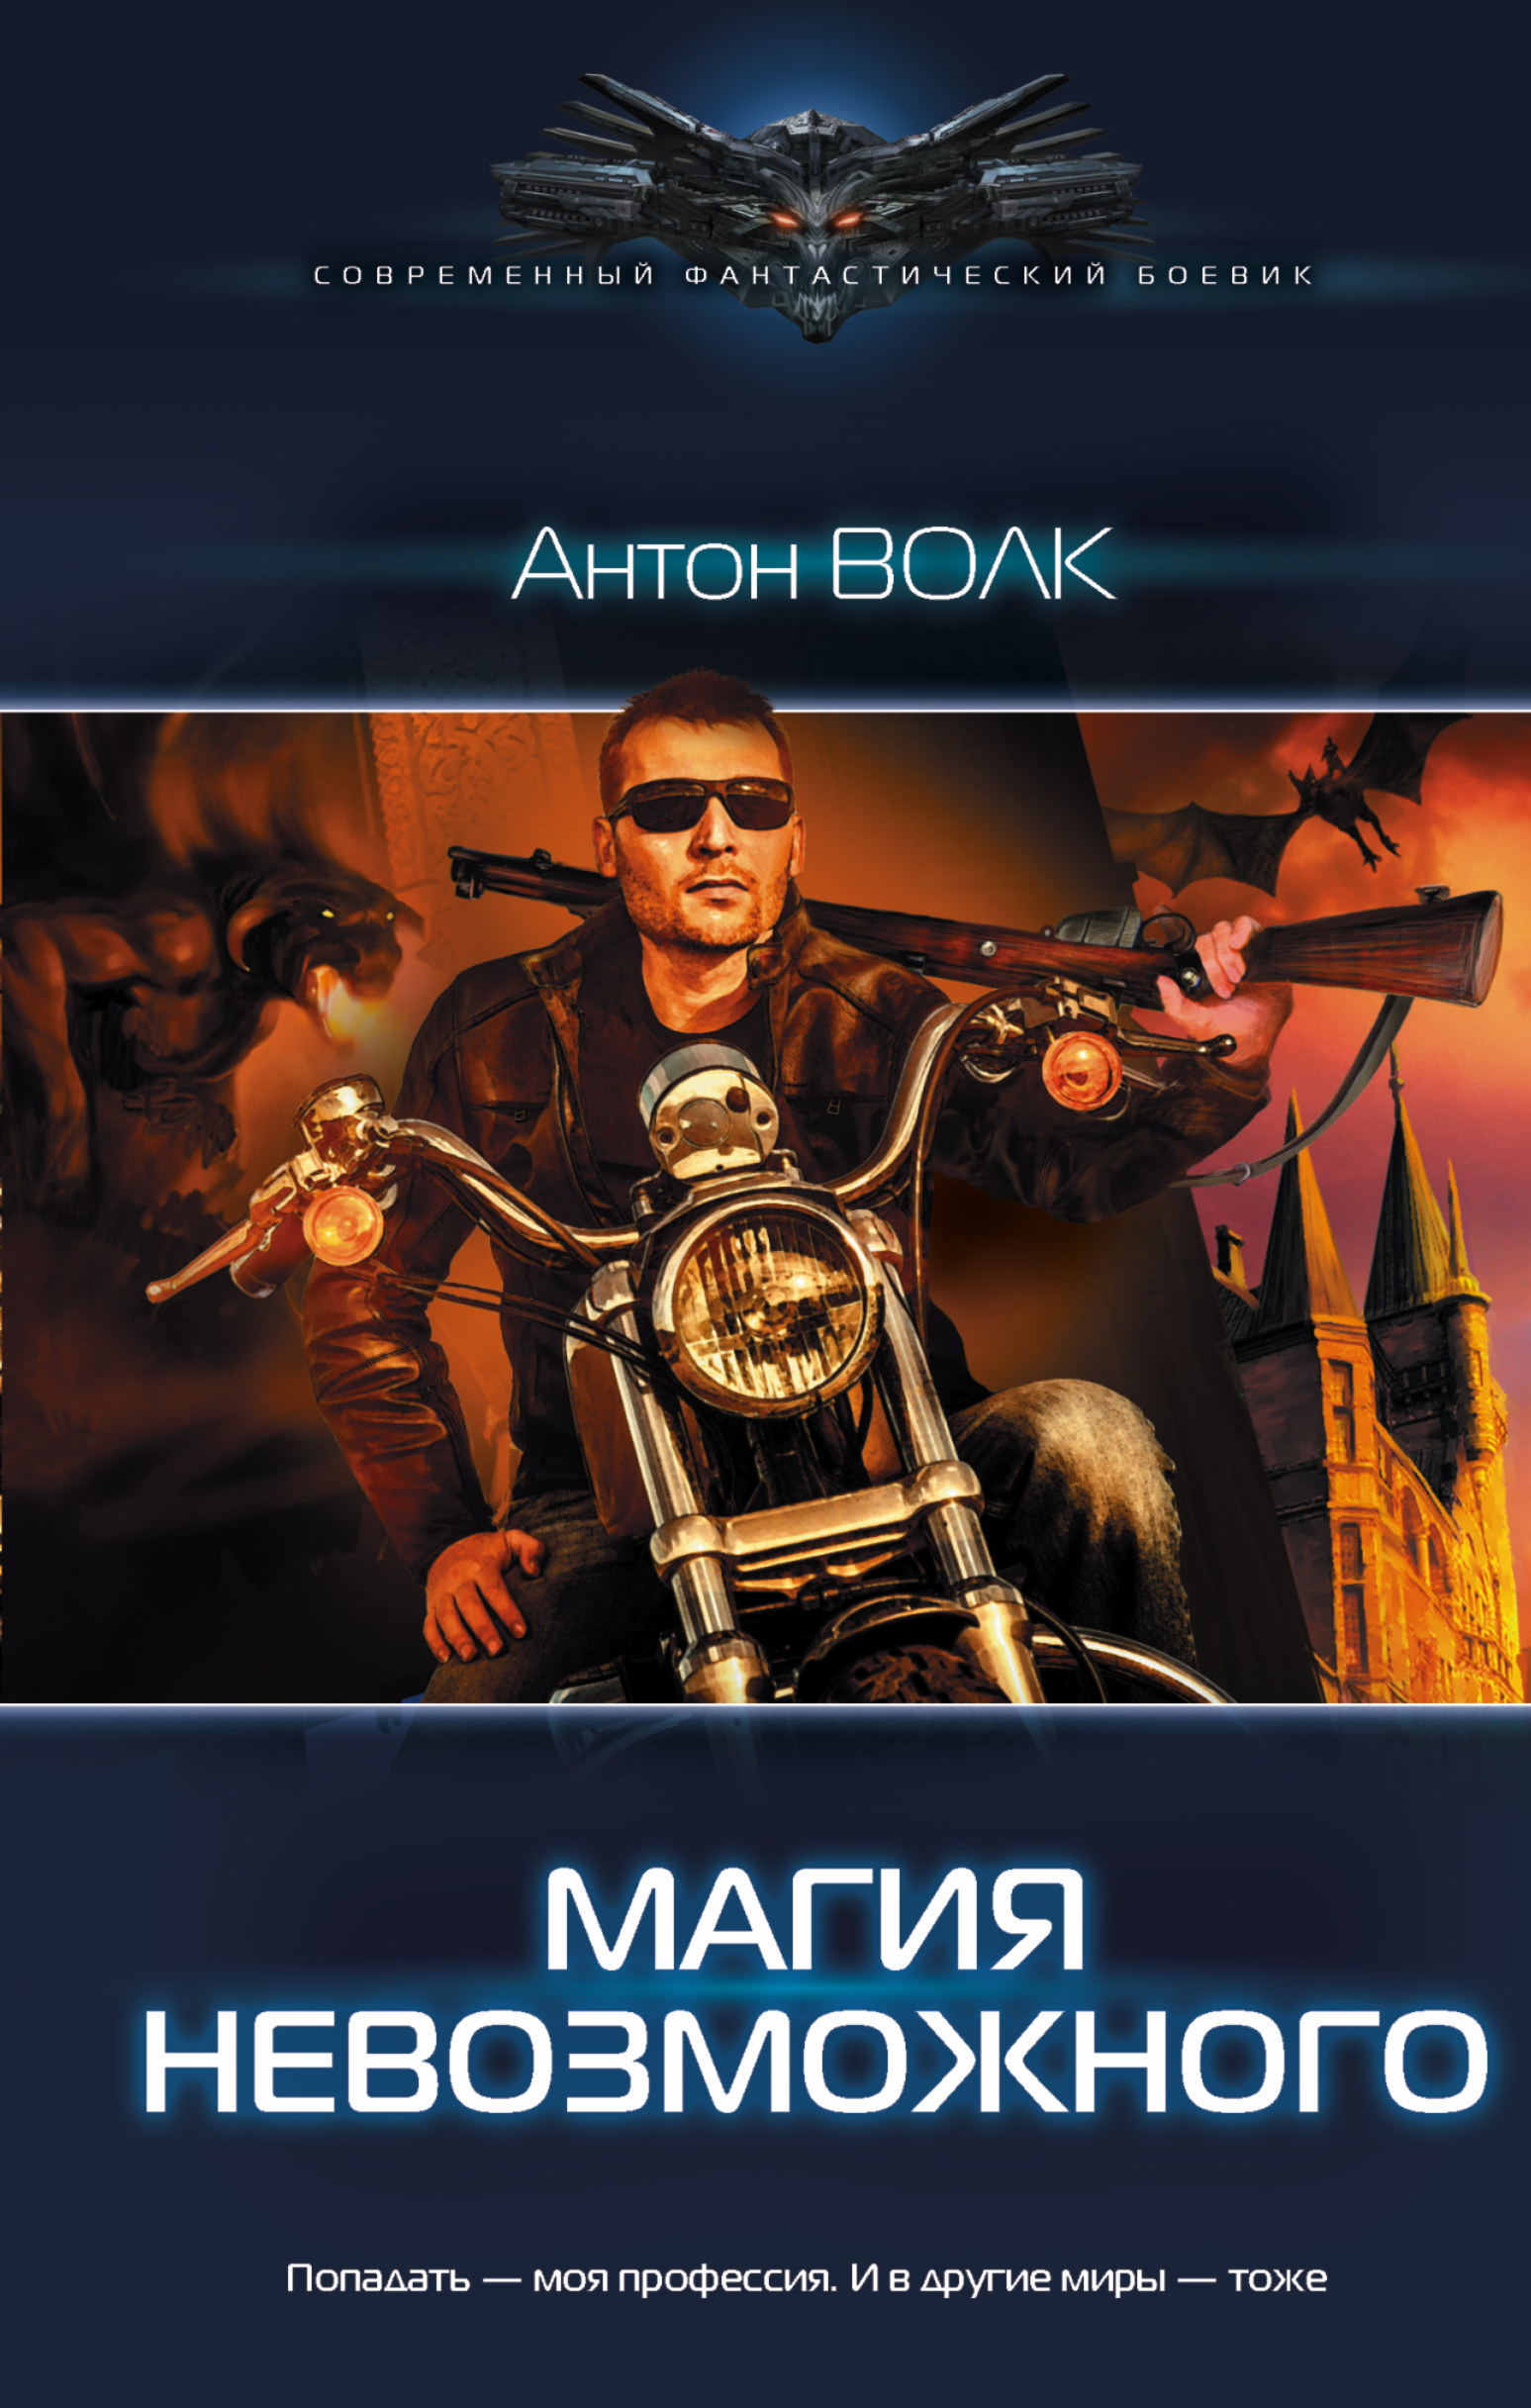 Волк Антон Магия невозможного магия невозможного